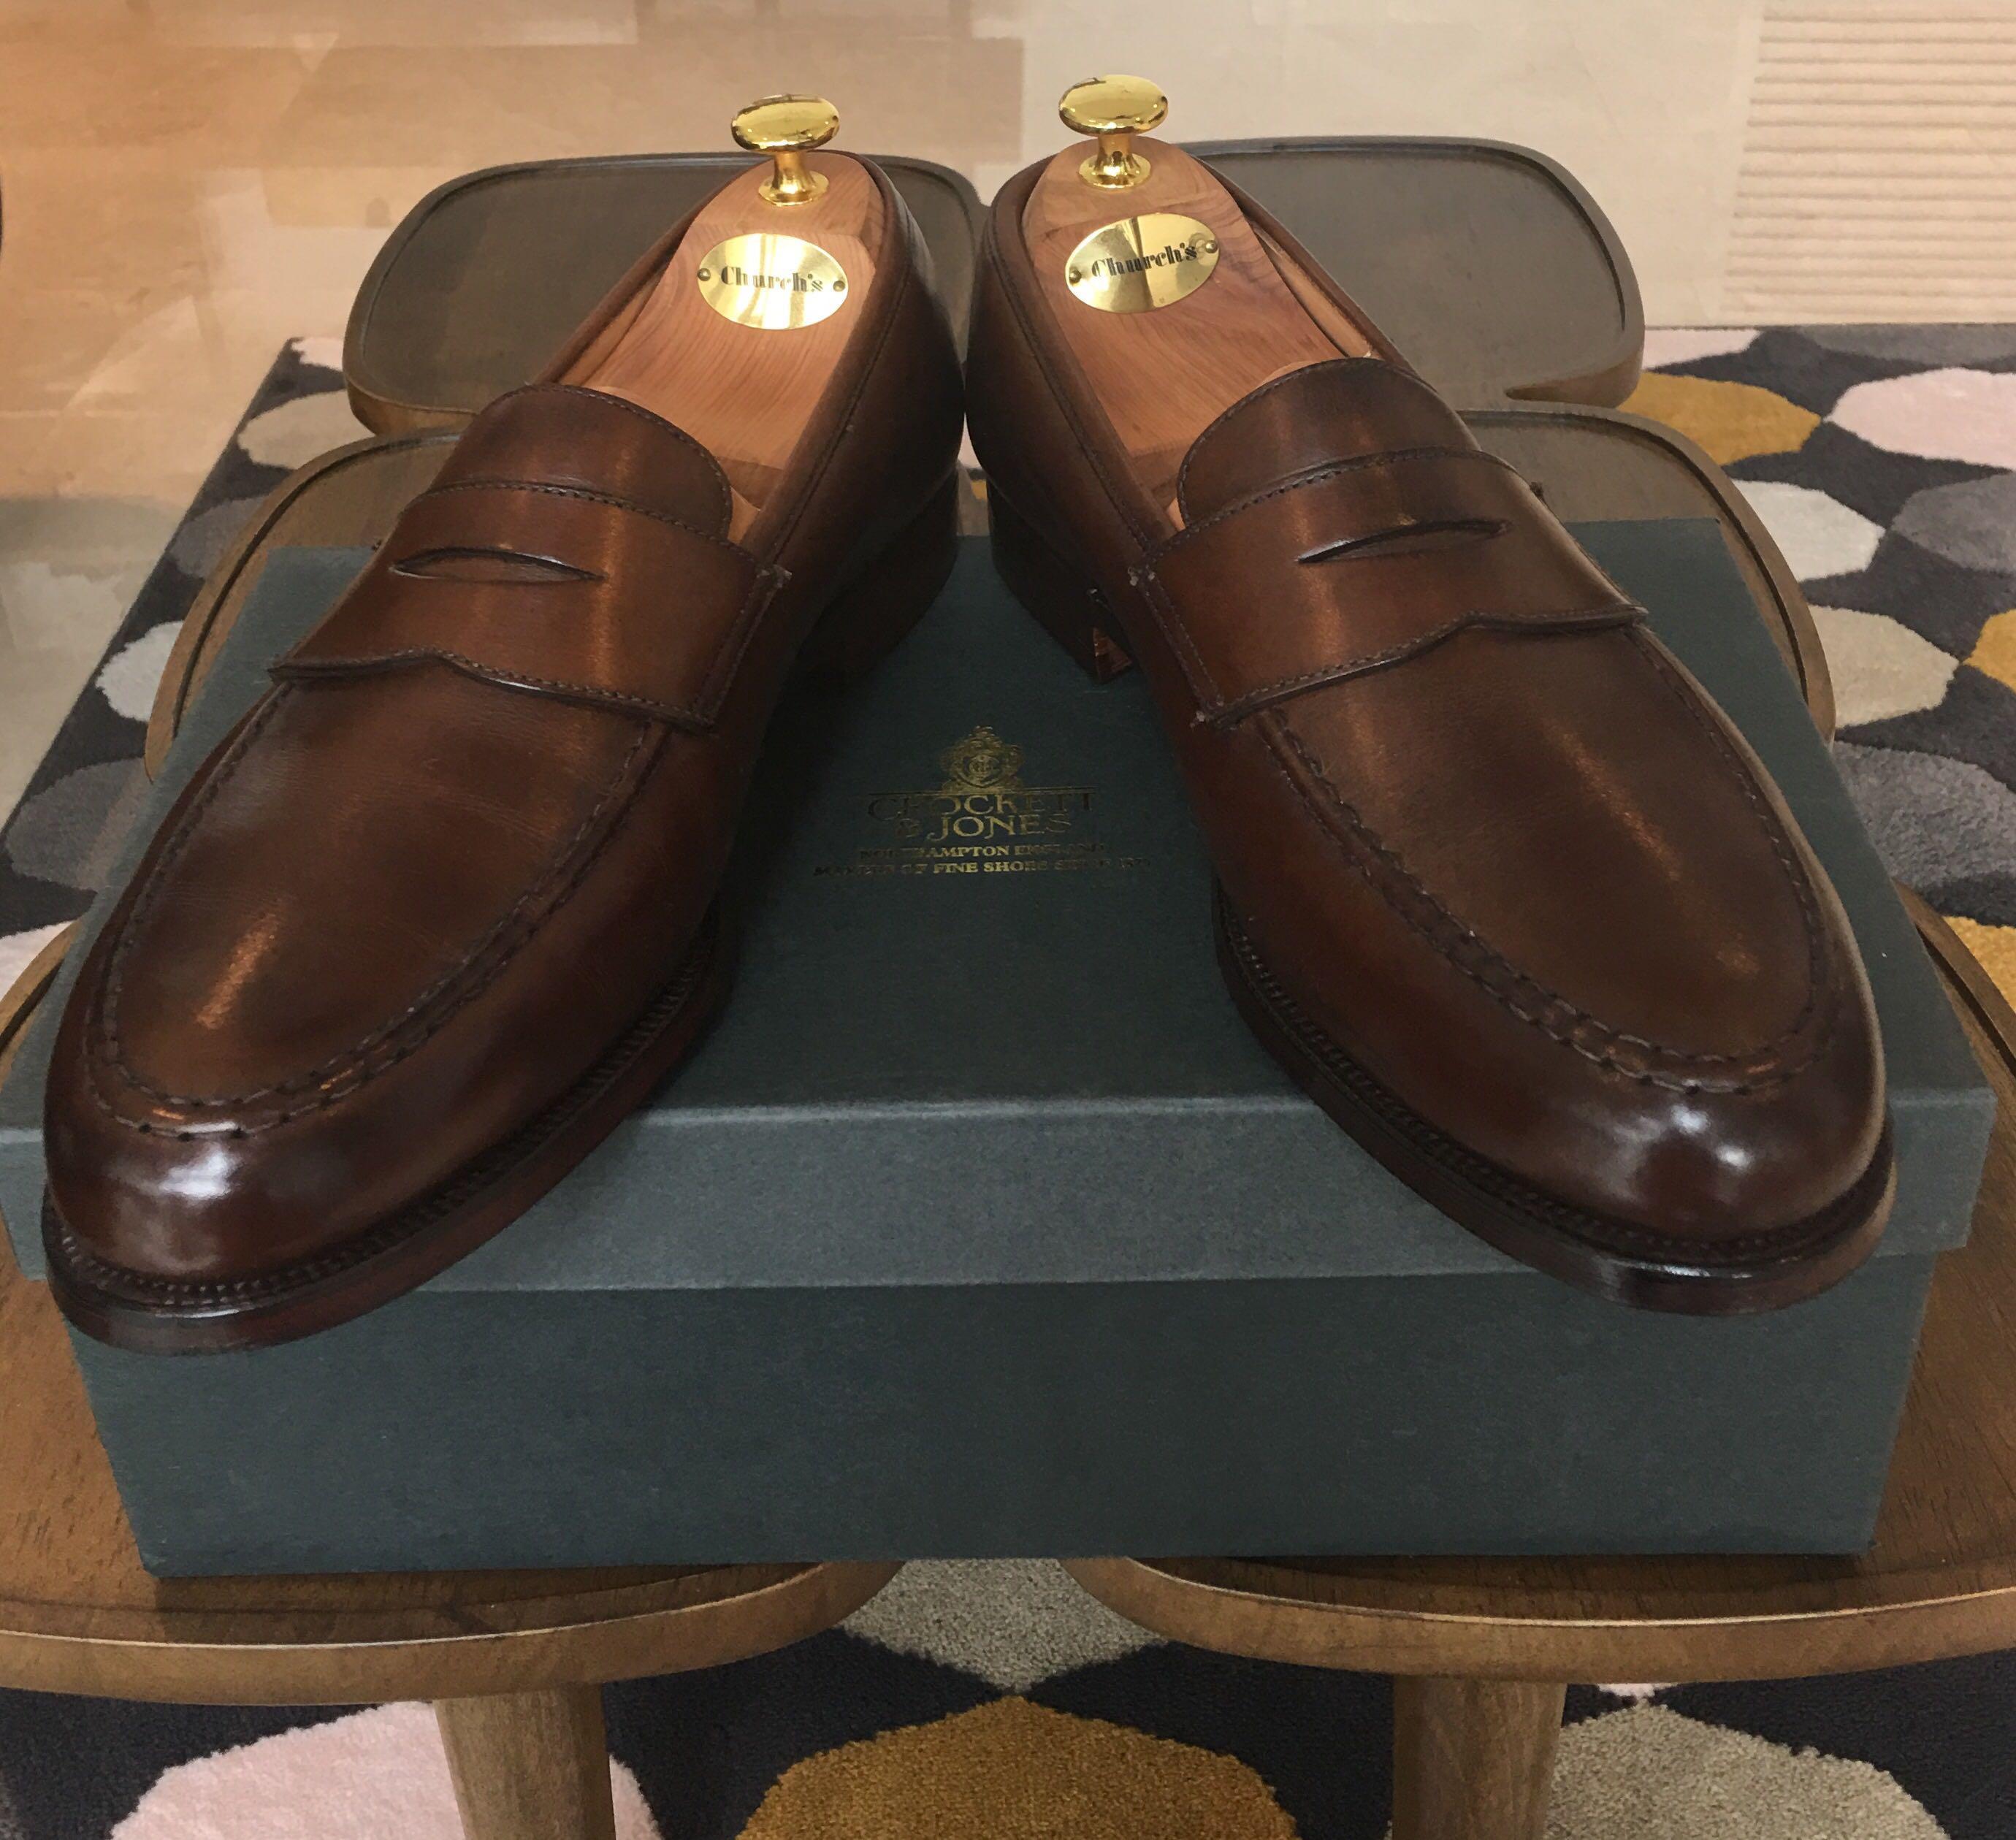 Crockett \u0026 Jones loafers (brand new